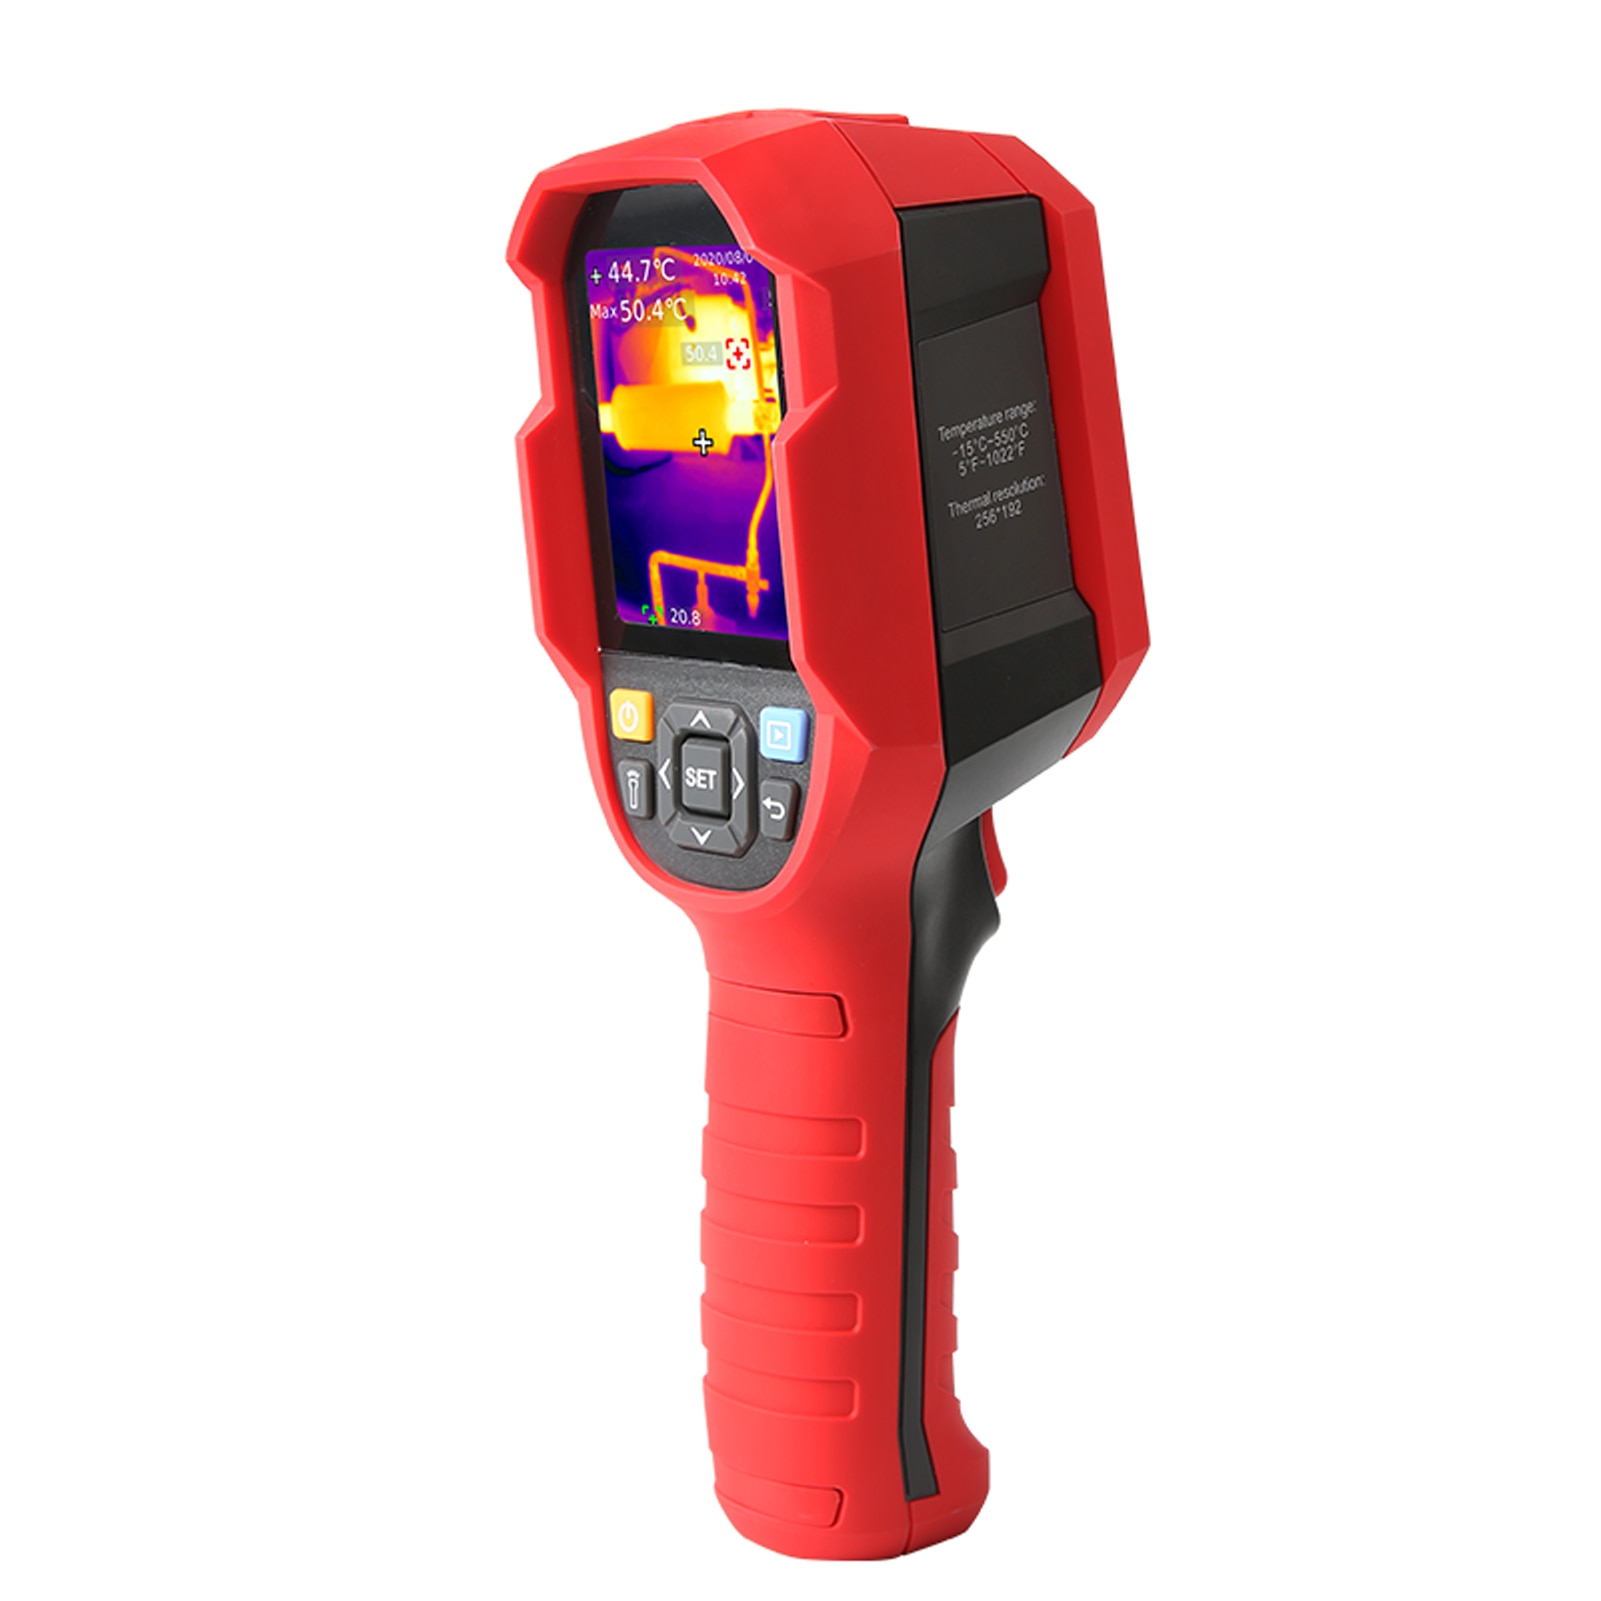 UNI-T UTi260B تصوير الحراري بالأشعة تحت الحمراء الحرارية التصوير بكسل سطح درجة الحرارة الوقت الحقيقي الحرارية الصور تصوير الحراري